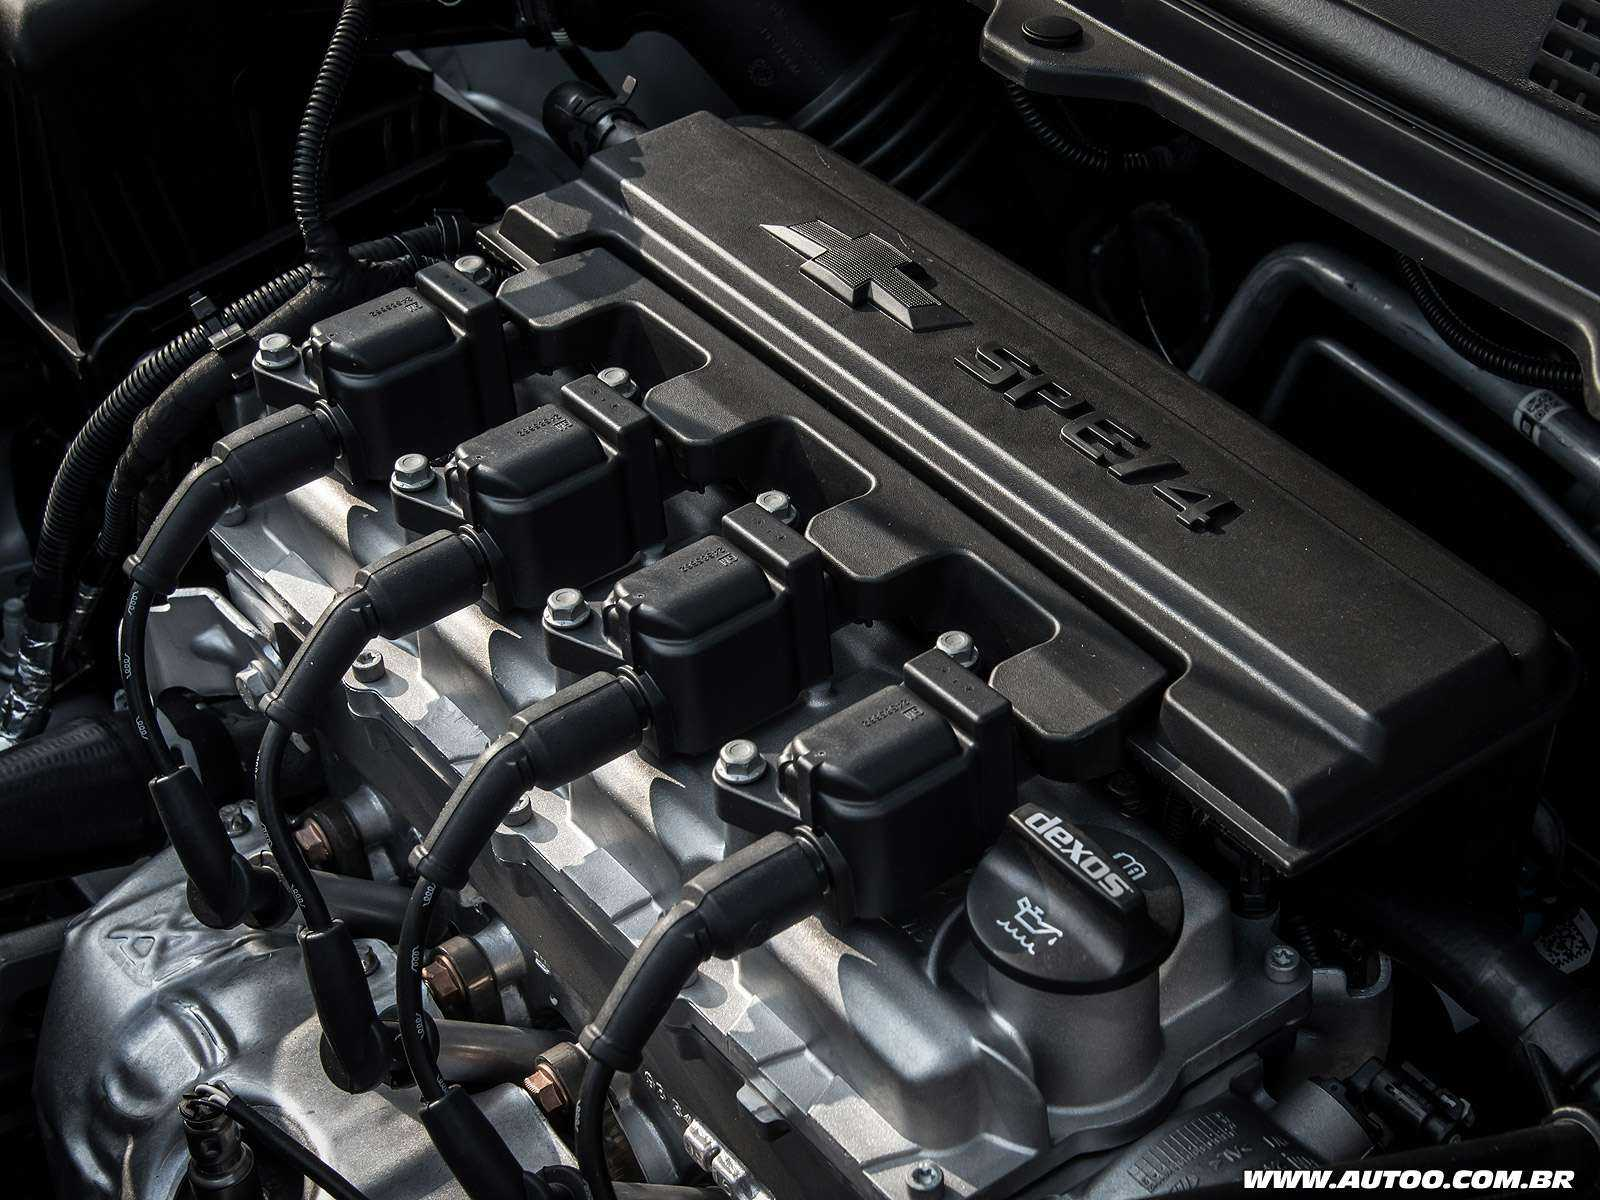 ChevroletPrisma 2018 - motor